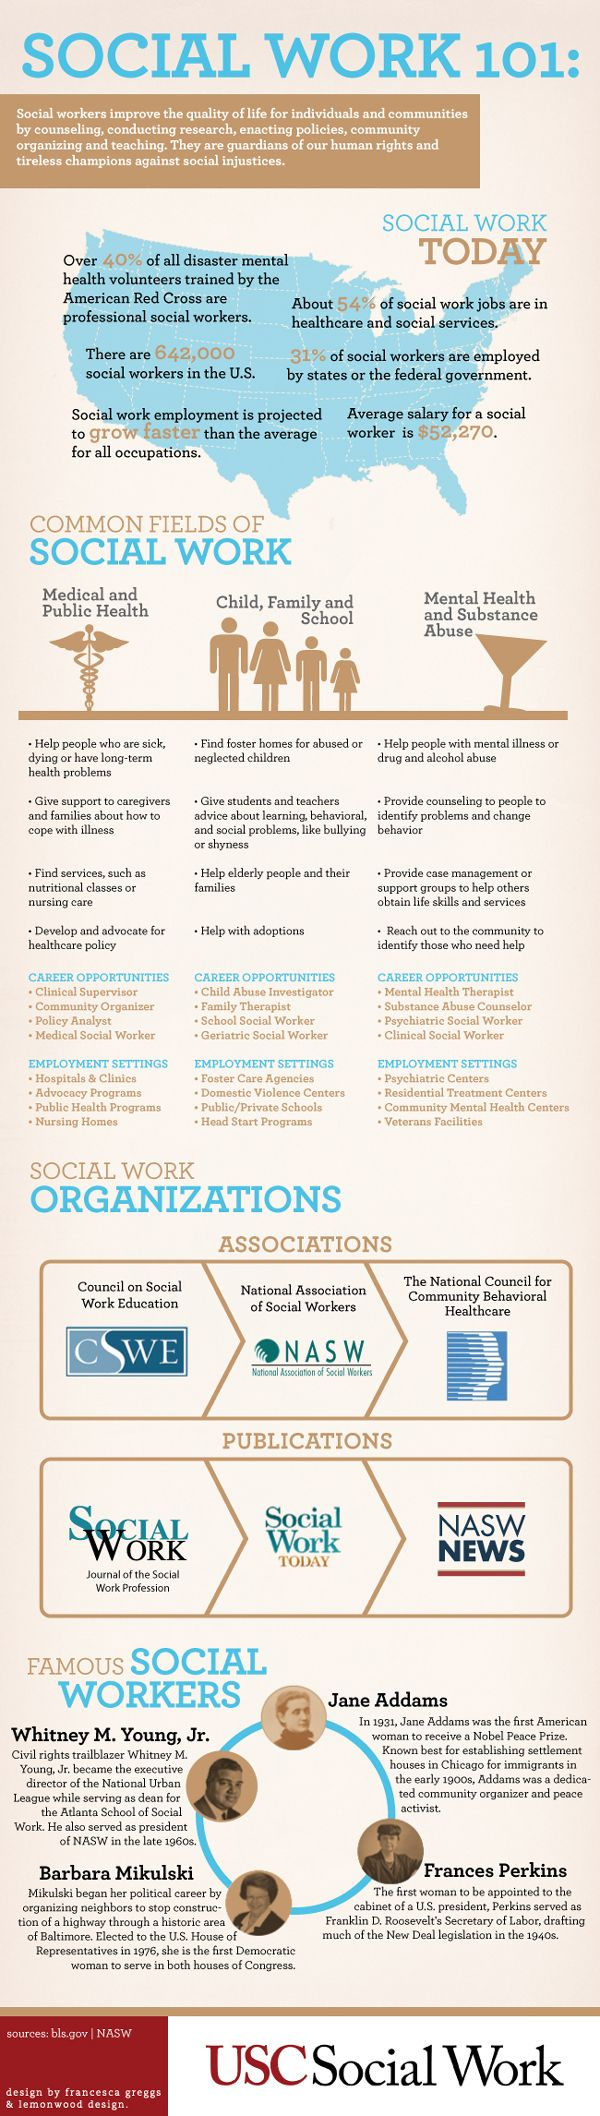 Social Work (USA) #infografia #infographic